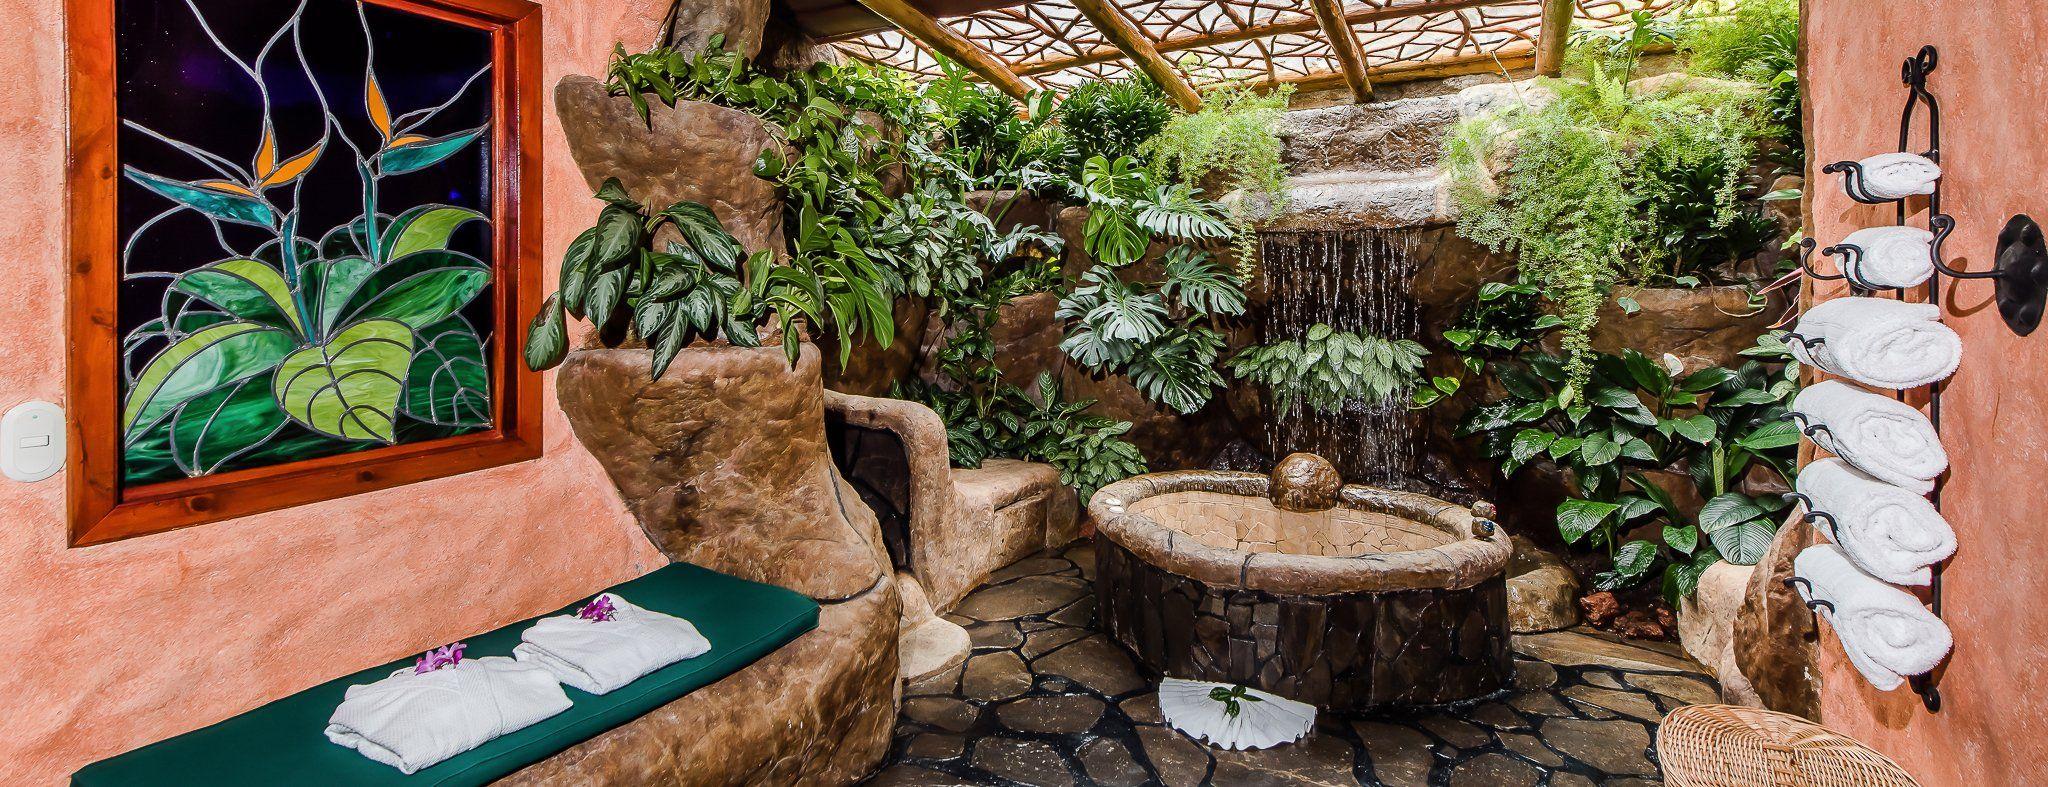 Peace Lodge, Small romantic boutique rainforest hotel near San José ...